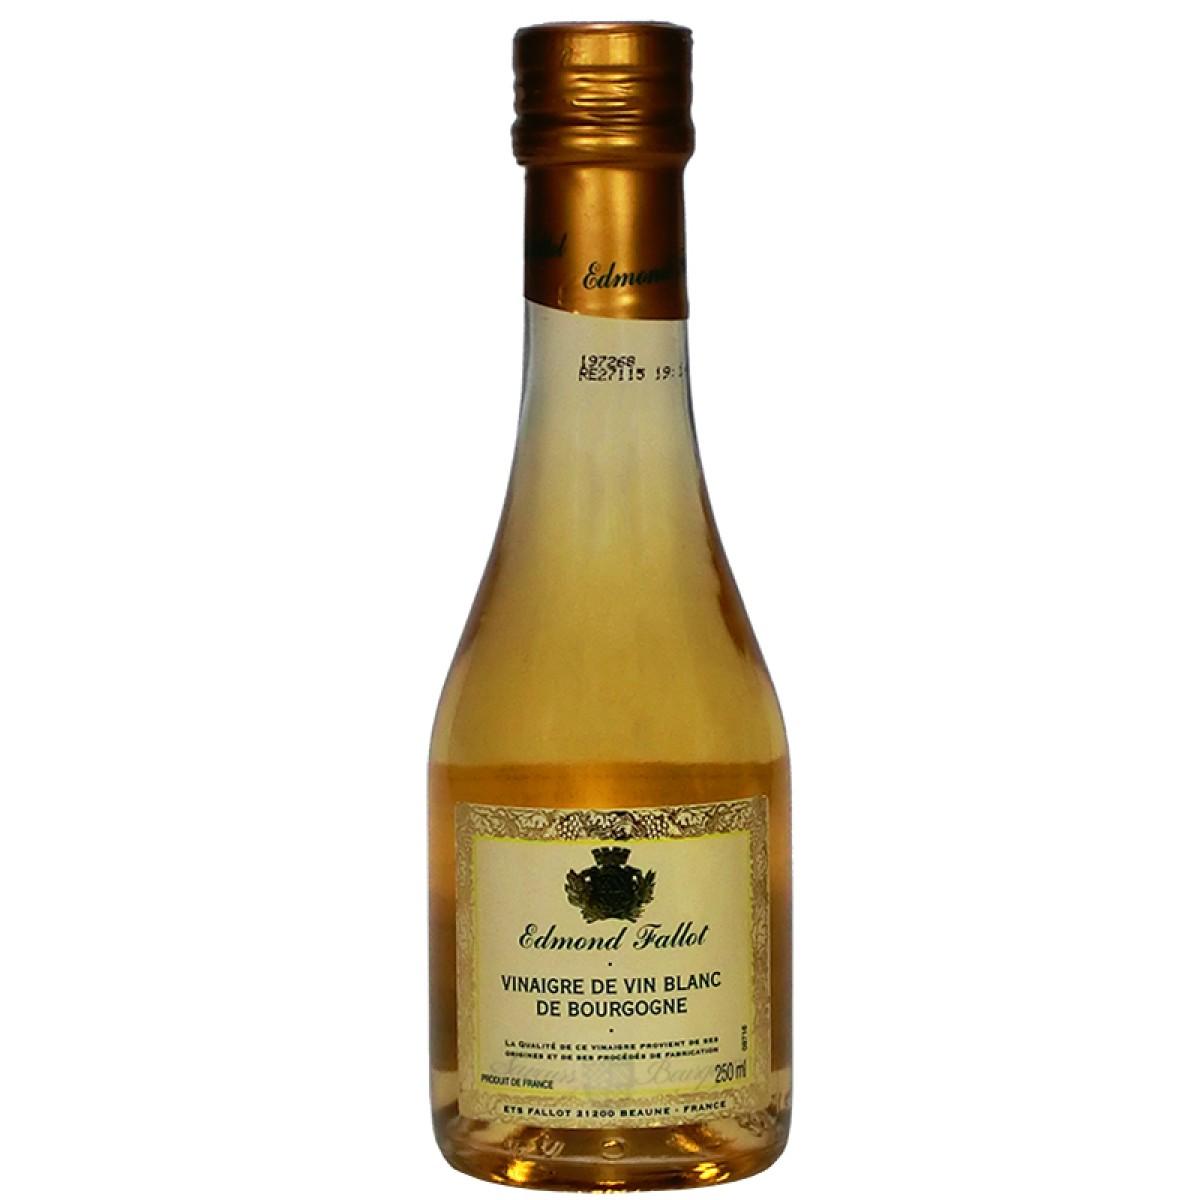 Vinaigre de vin blanc de bourgogne 250ml fallot saveurs de bourgogne vent - Moutarde fallot vente ...